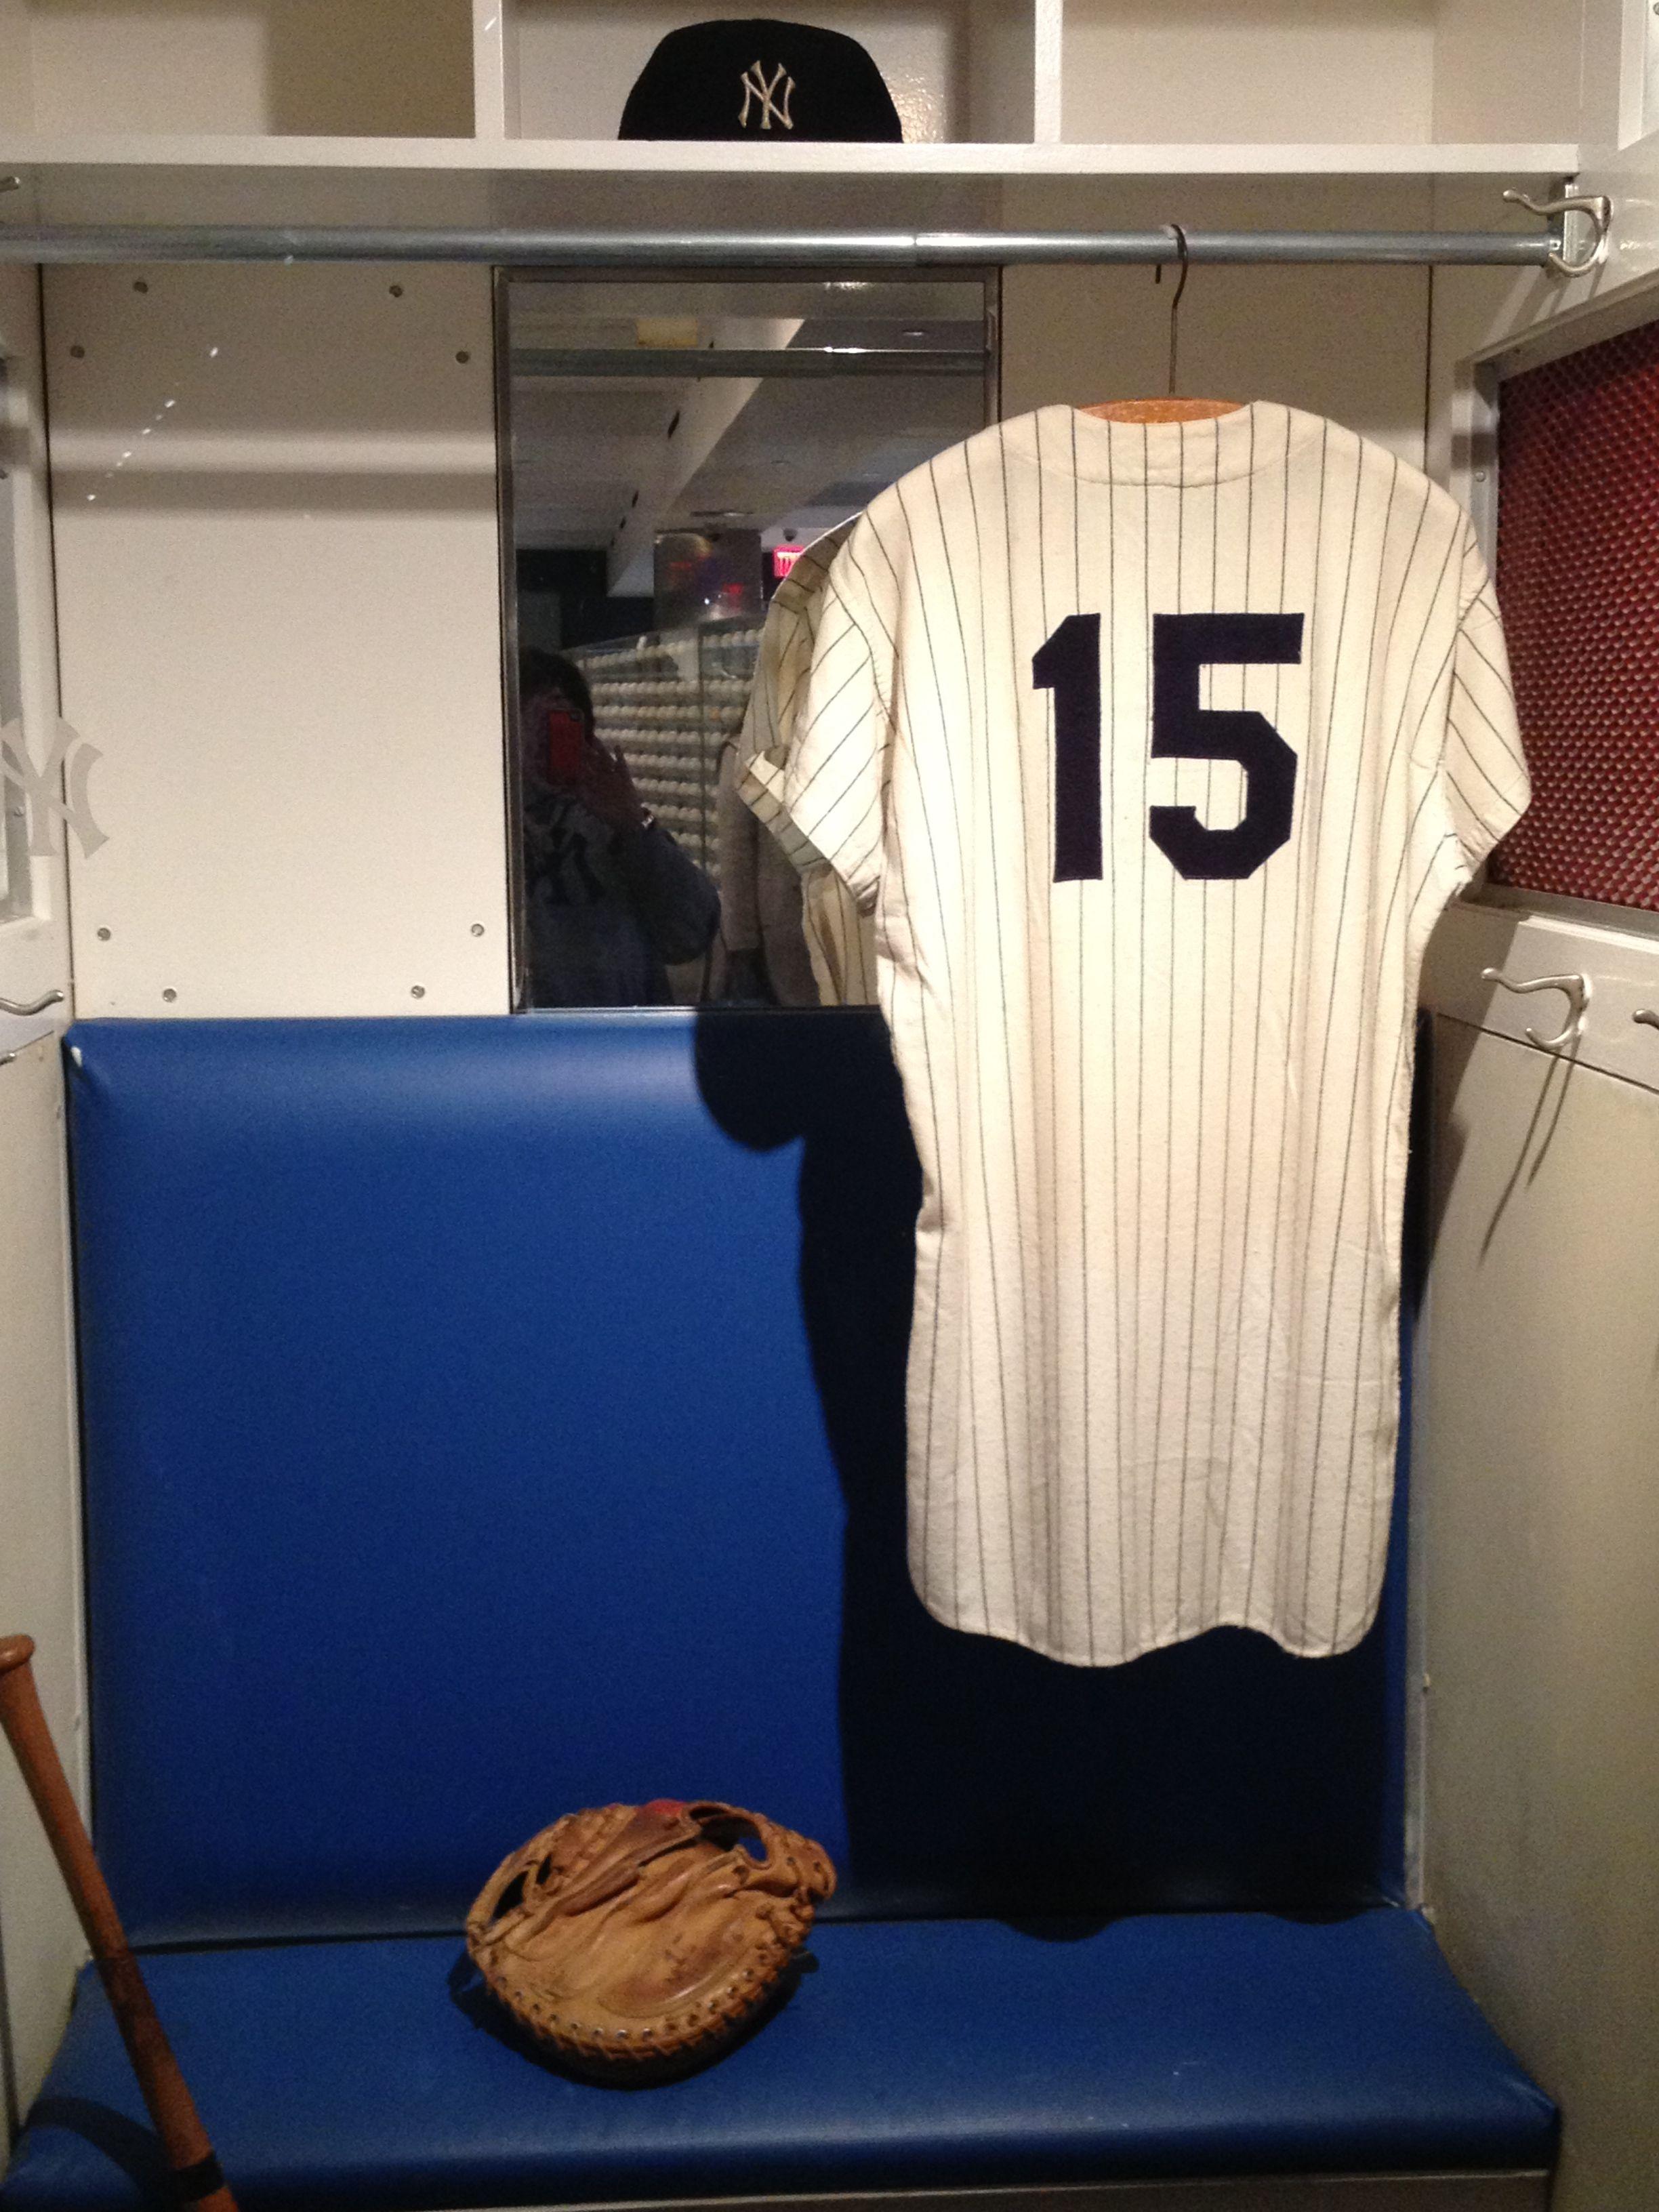 wholesale dealer 9f4e5 f9ff0 Thurman Munson's locker on display at Yankee stadium ...